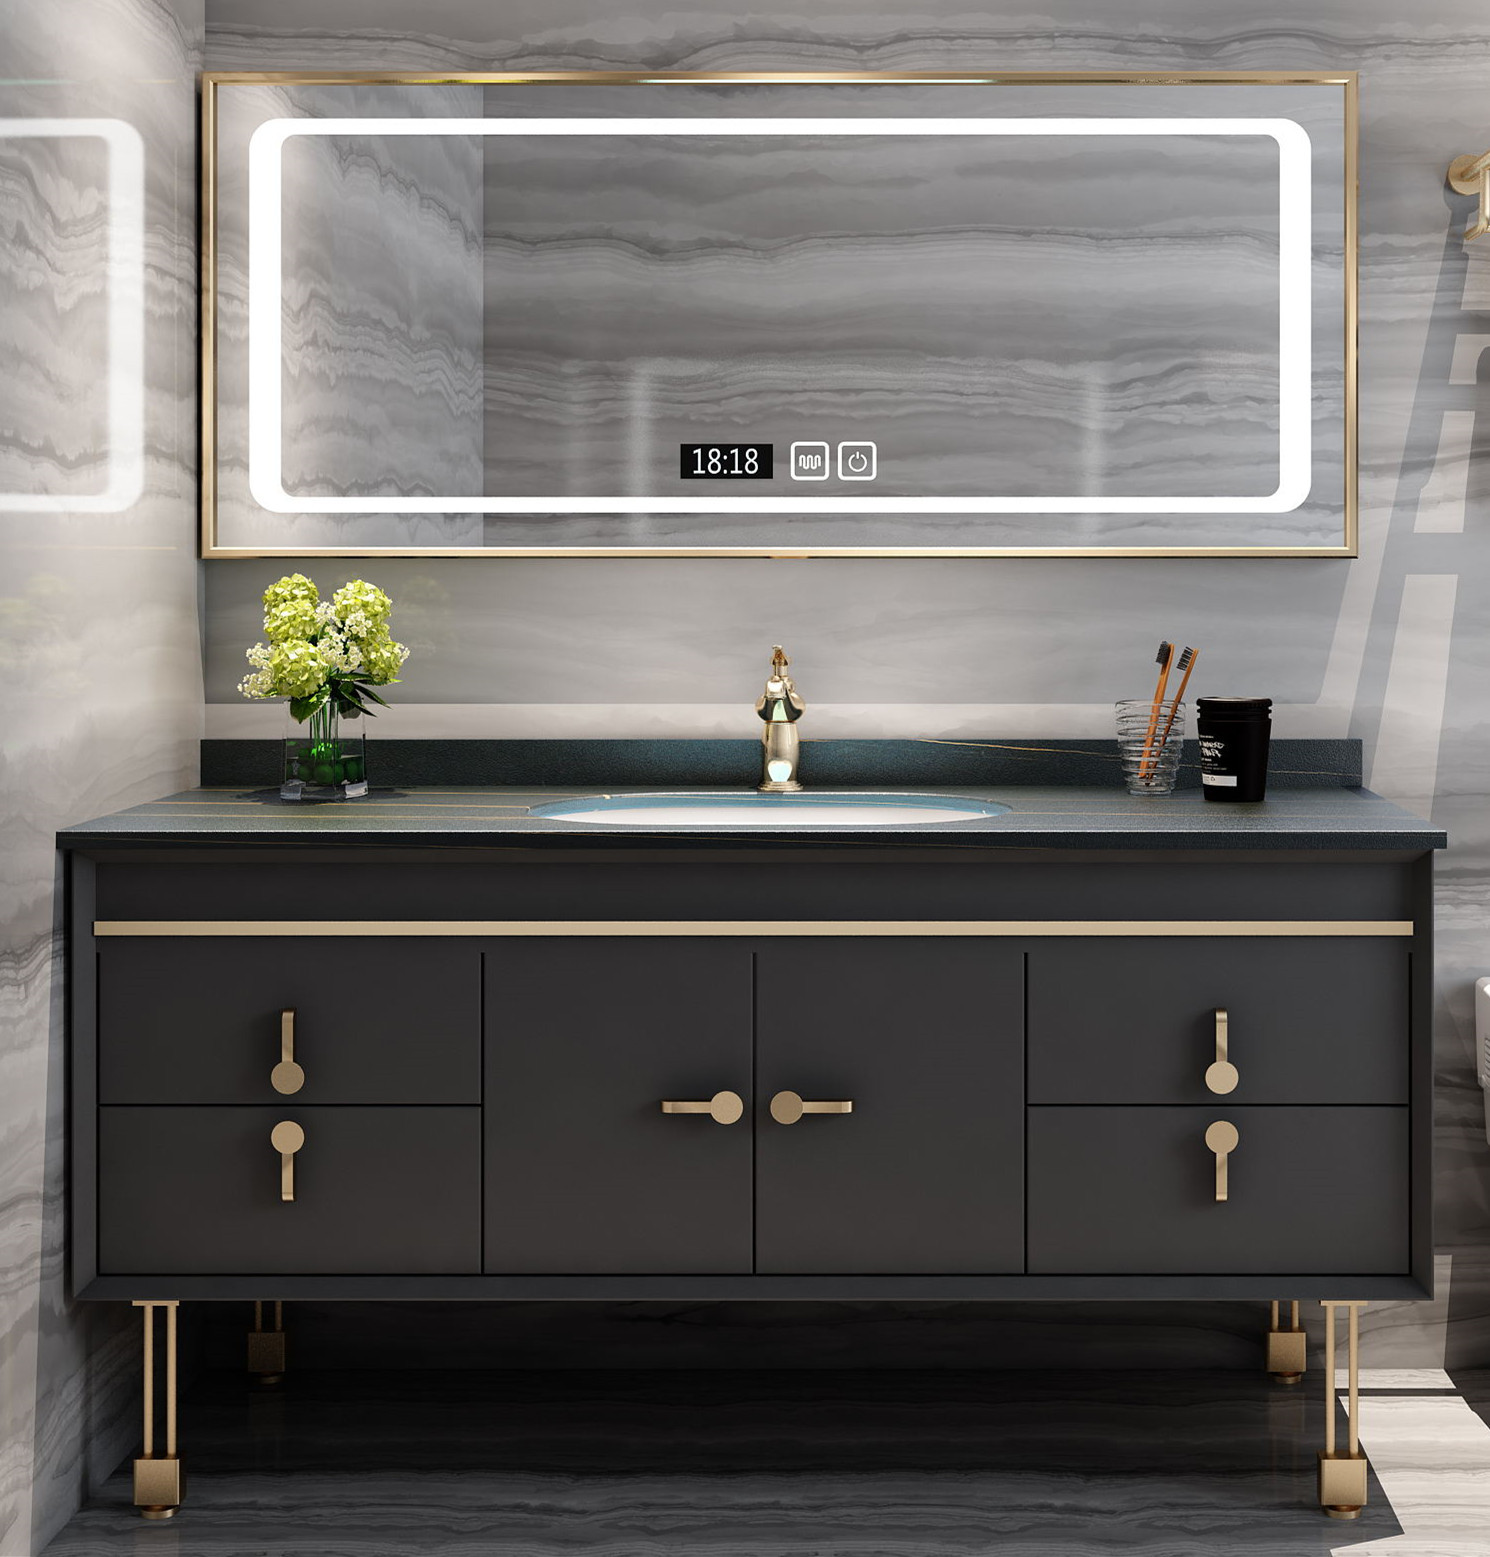 KAFENJIE Modern light luxury slate bathroom cabinet combination Nordic intelligent light luxury wash